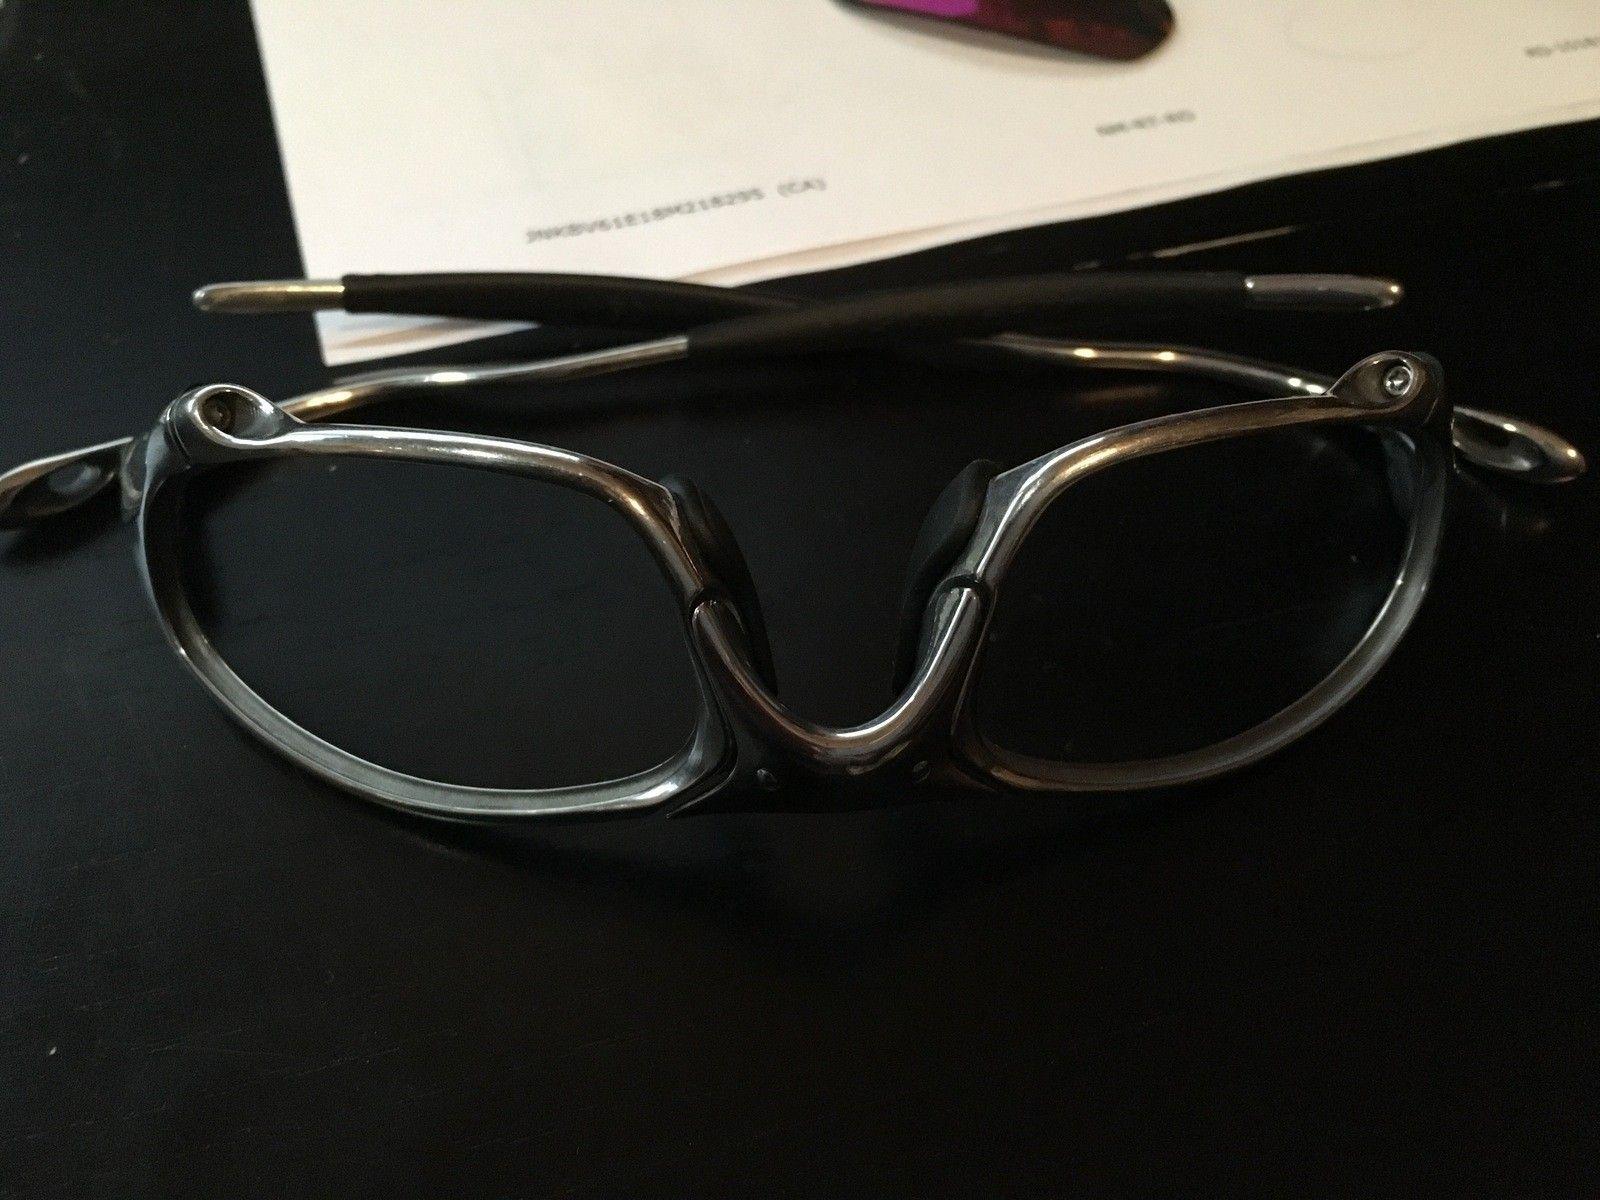 Juliet Polished w Fire Polarized lenses - $275 - 2016-01-17 23.36.32.jpg